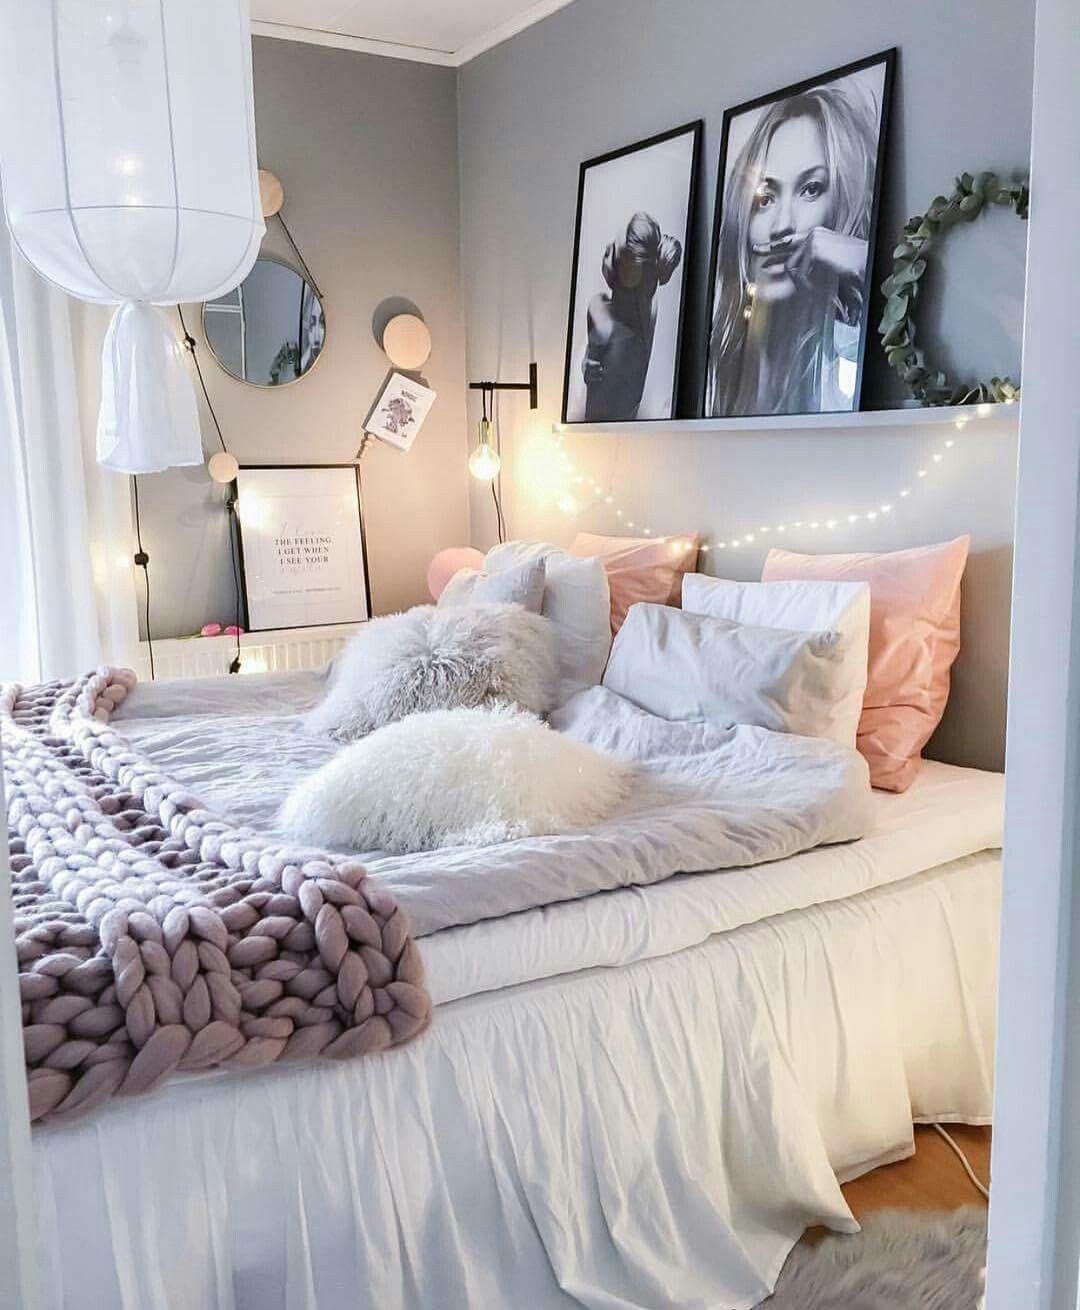 Pinterest lalalalizax  Bedroom Ideas  Bedroom decor